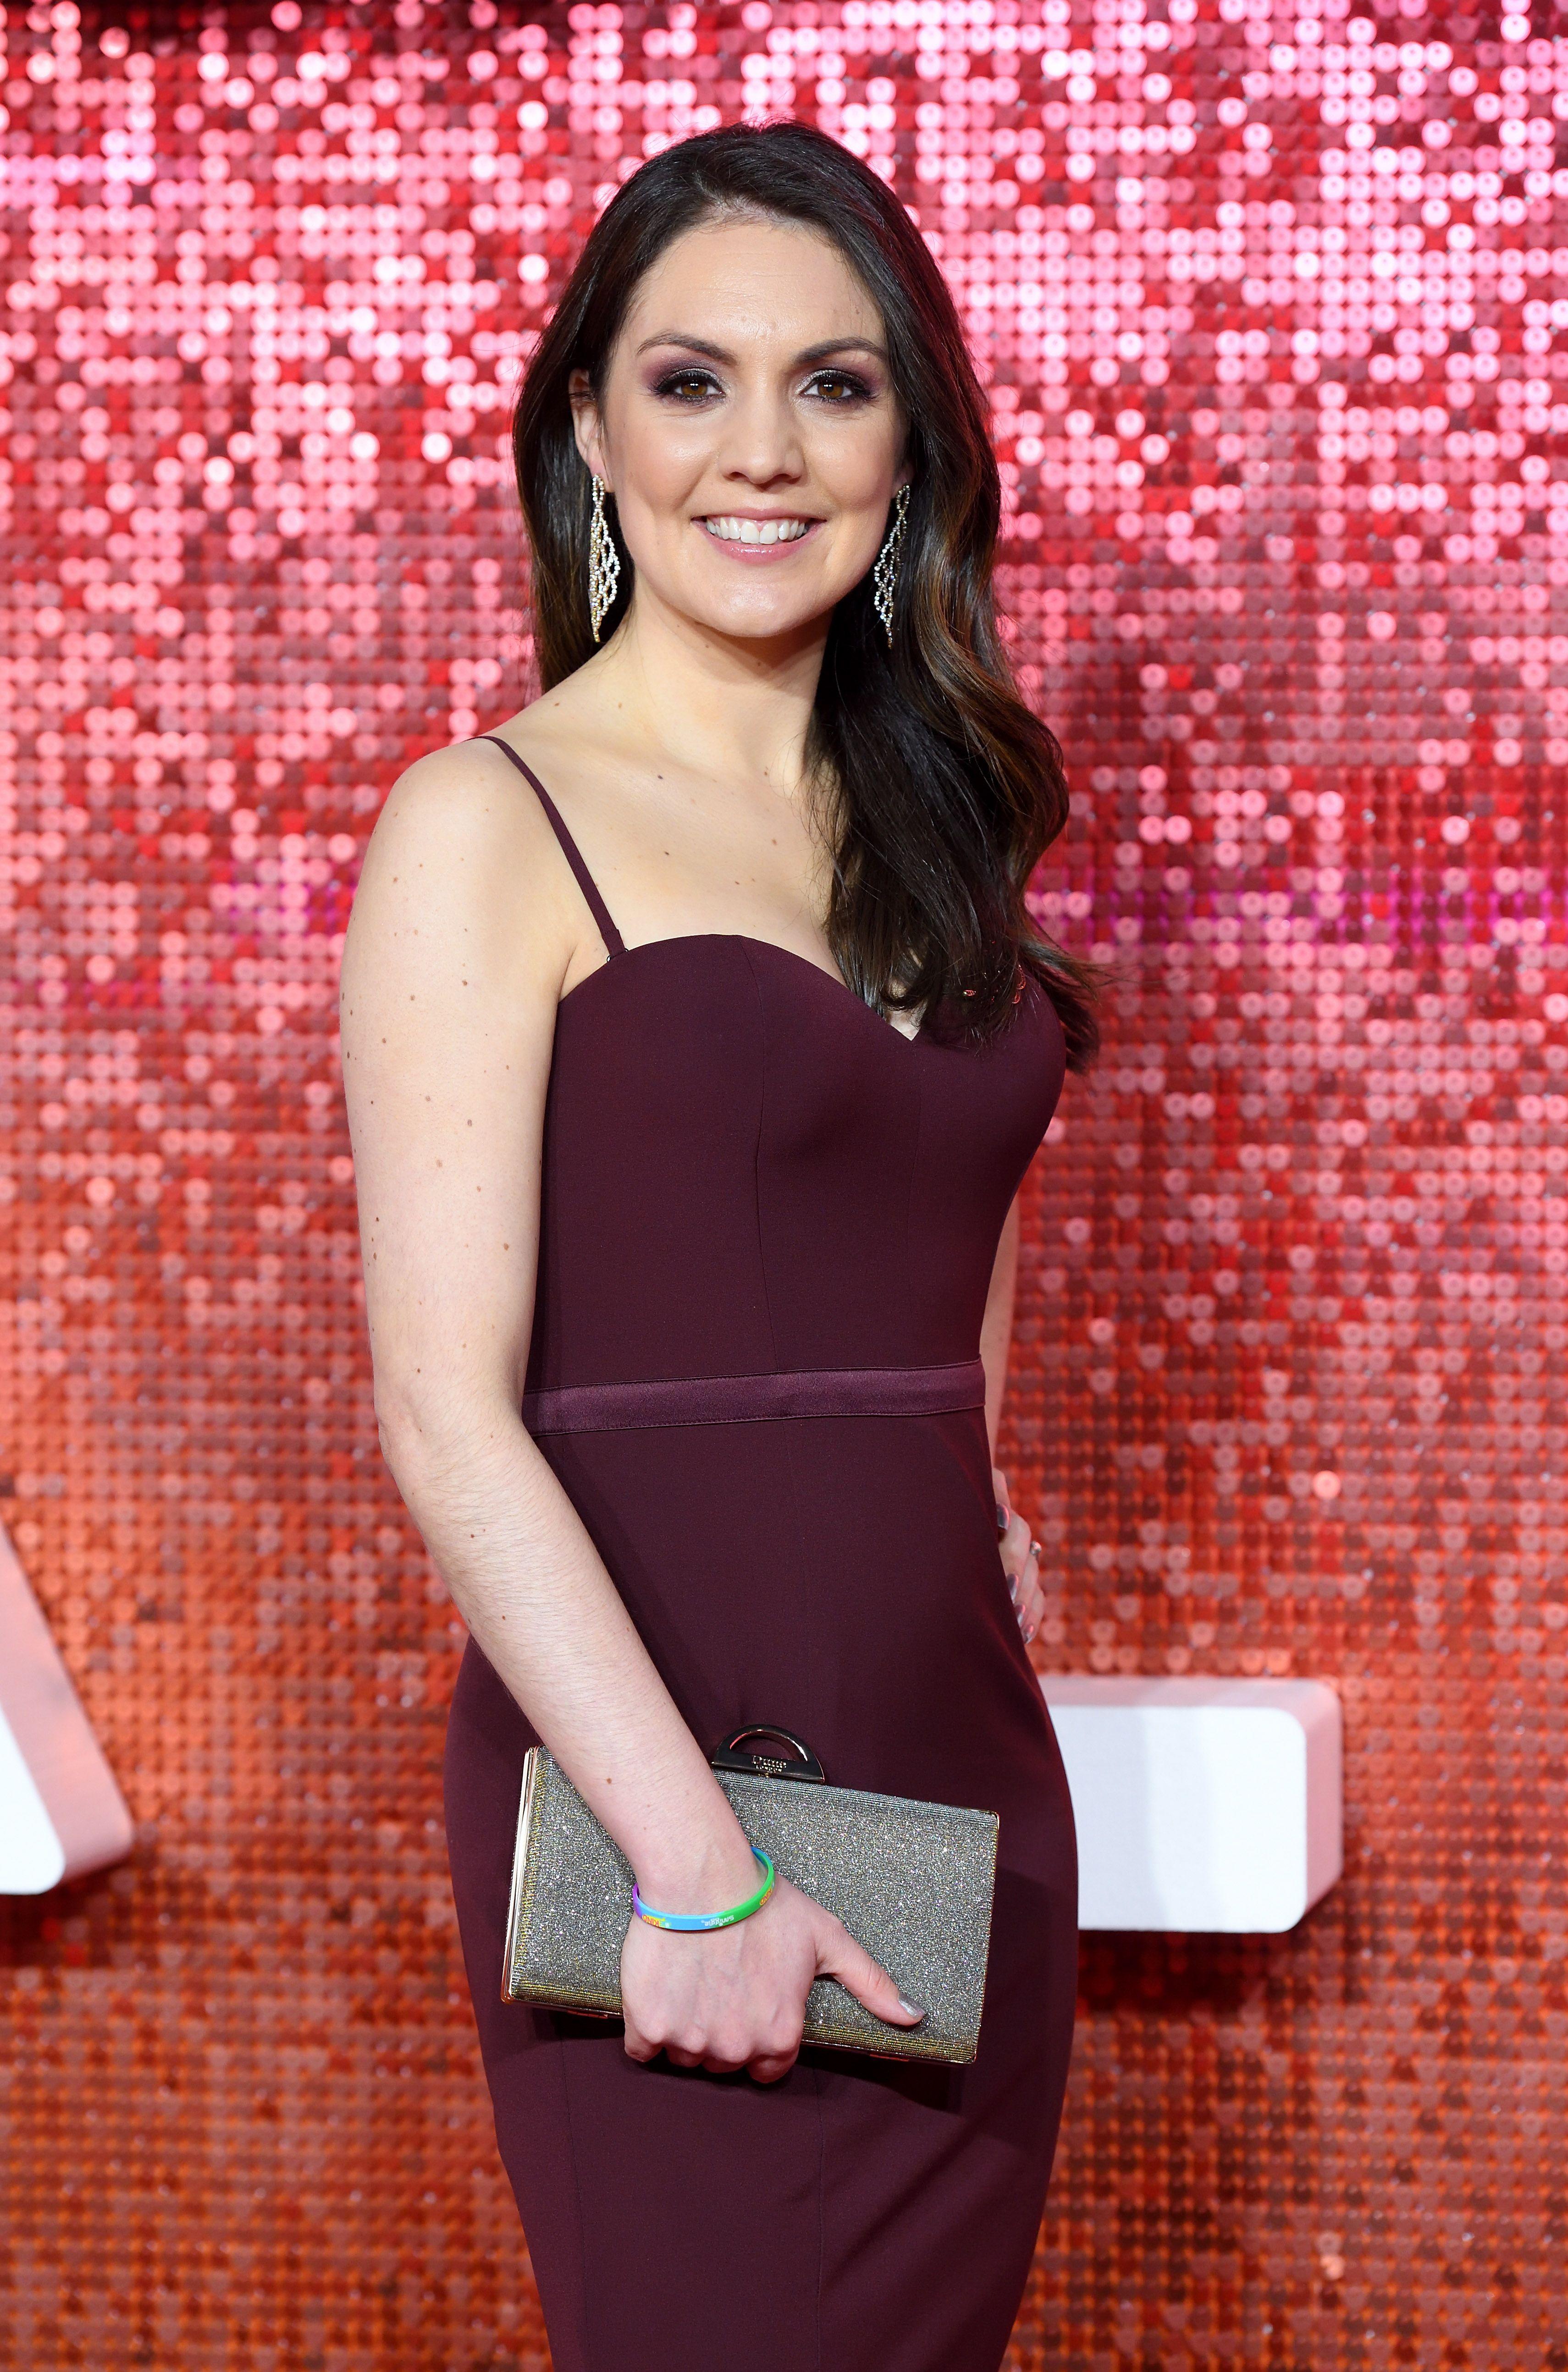 Good Morning Britain's Laura Tobin wears £25 Marks & Spencer jumper twice in the last week